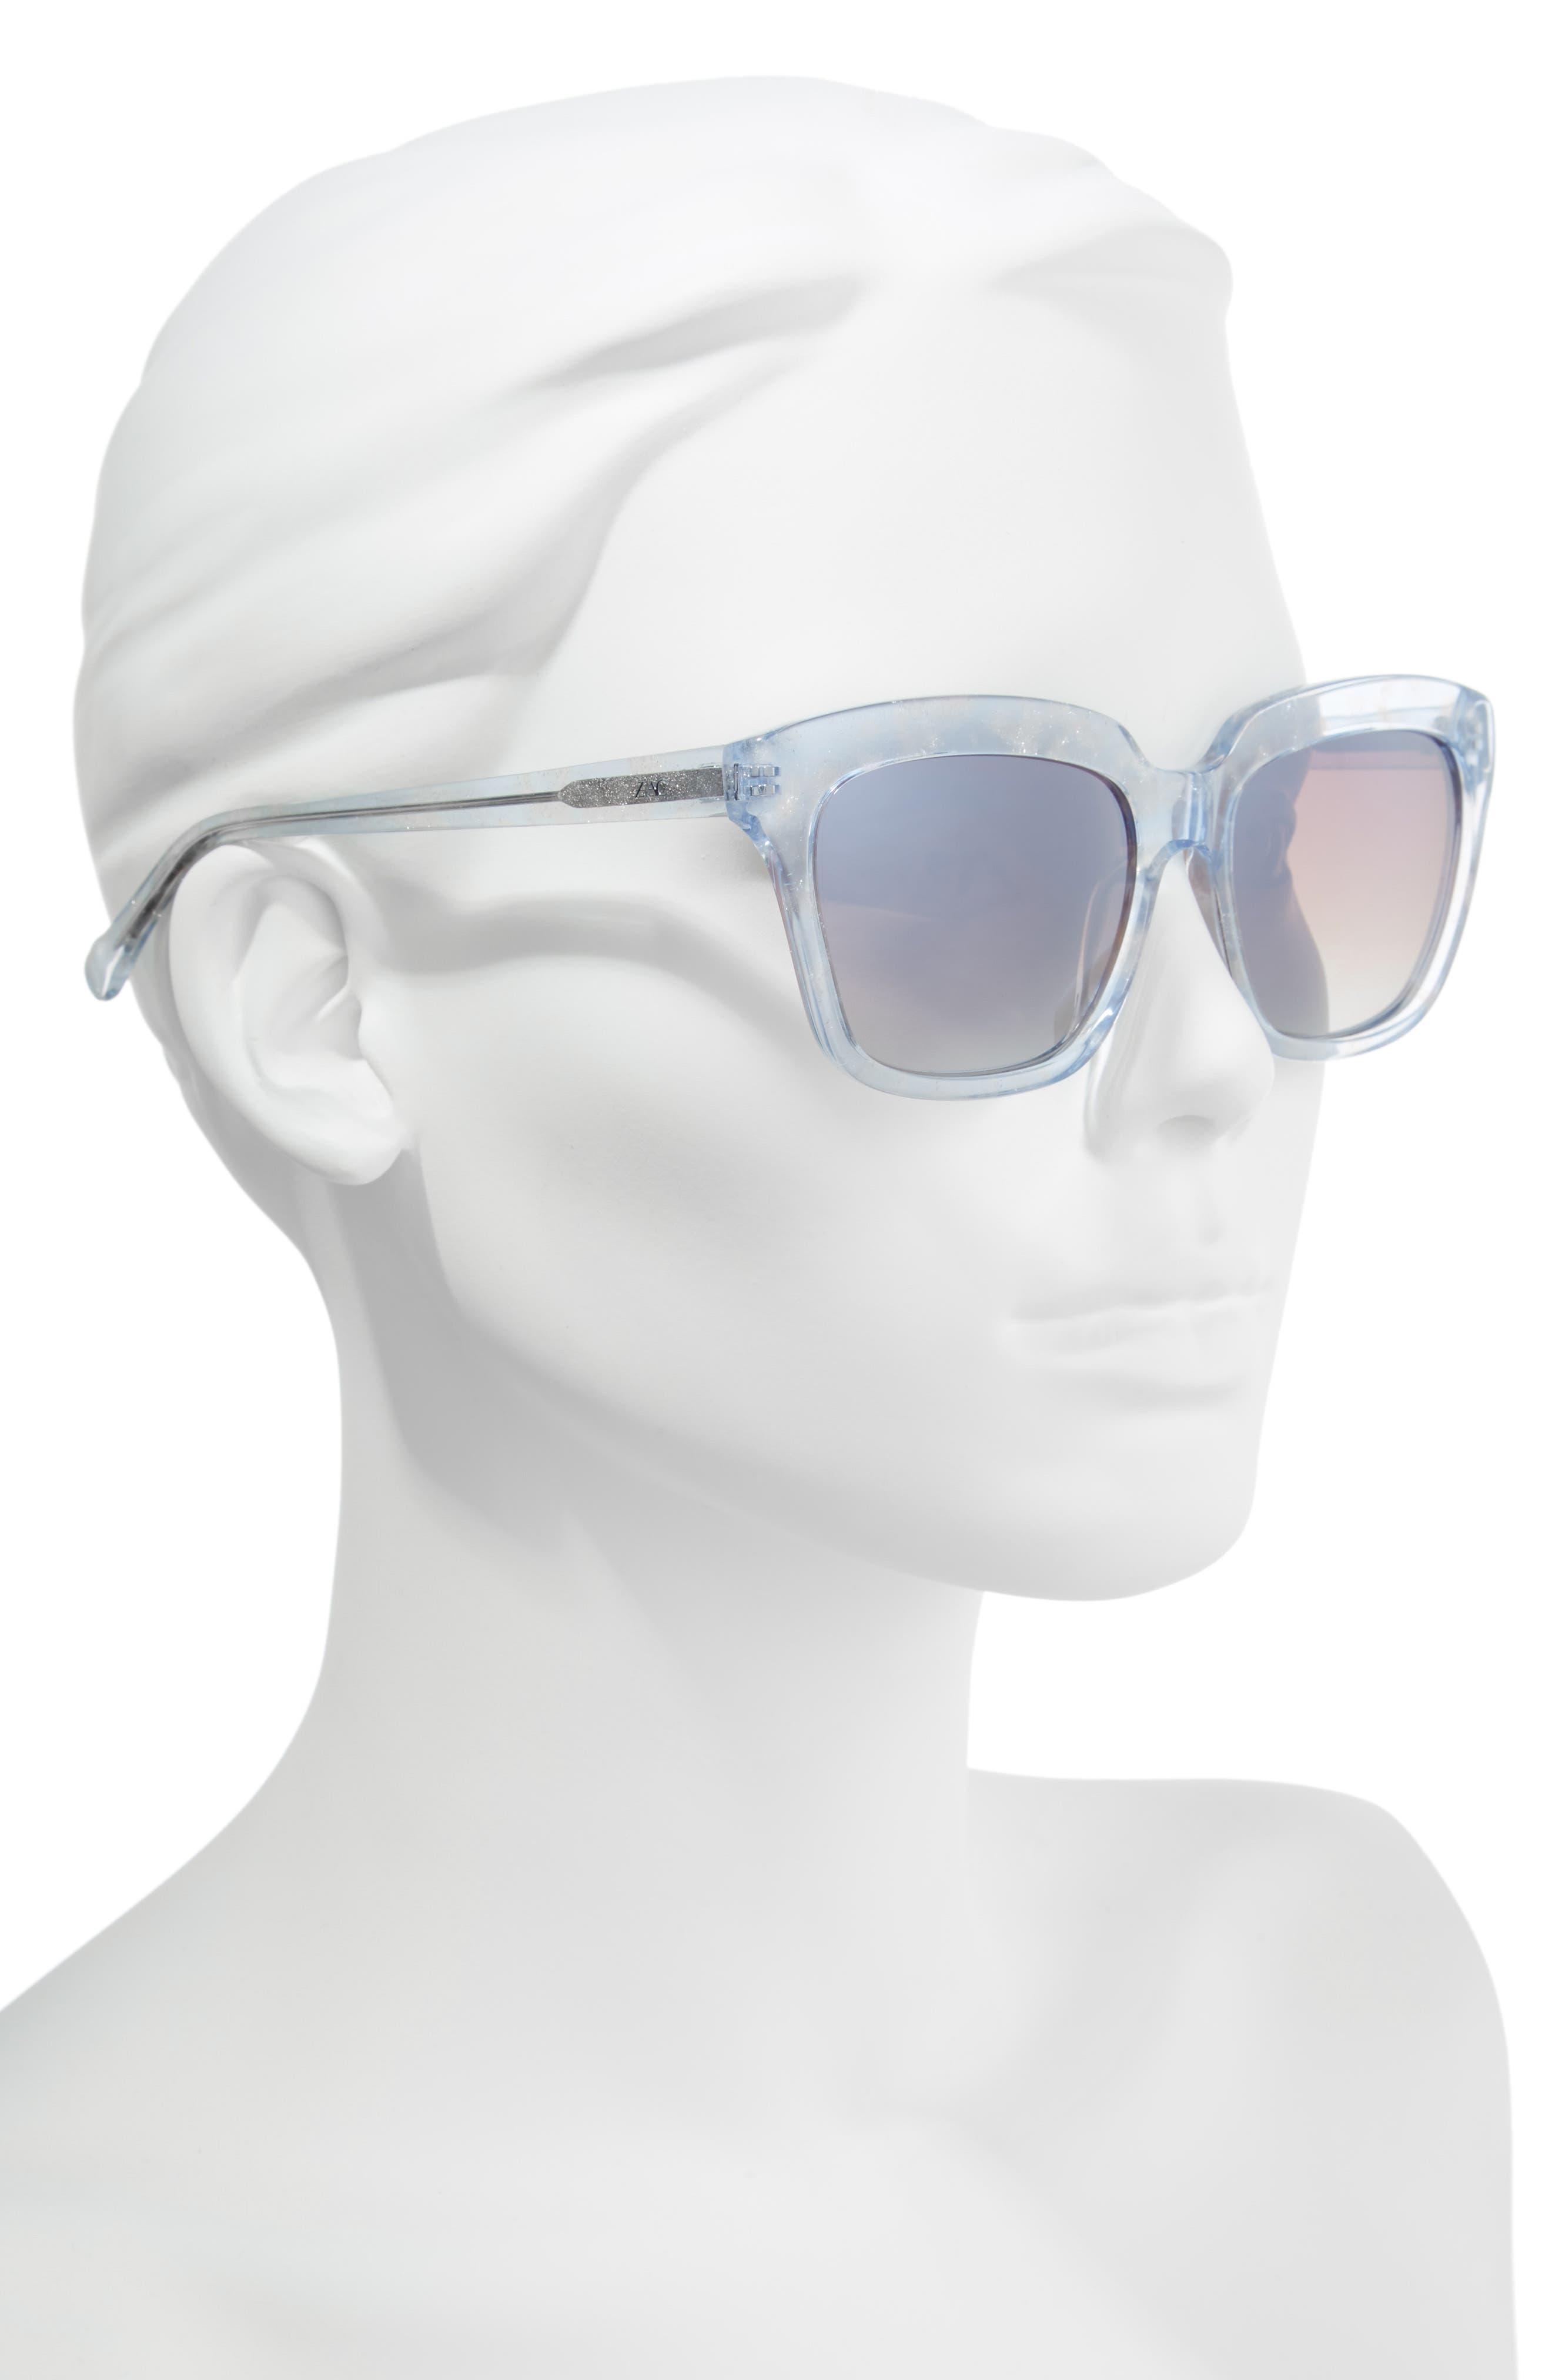 Adina 56mm Polarized Sunglasses,                             Alternate thumbnail 2, color,                             Blue Polar/ Greige